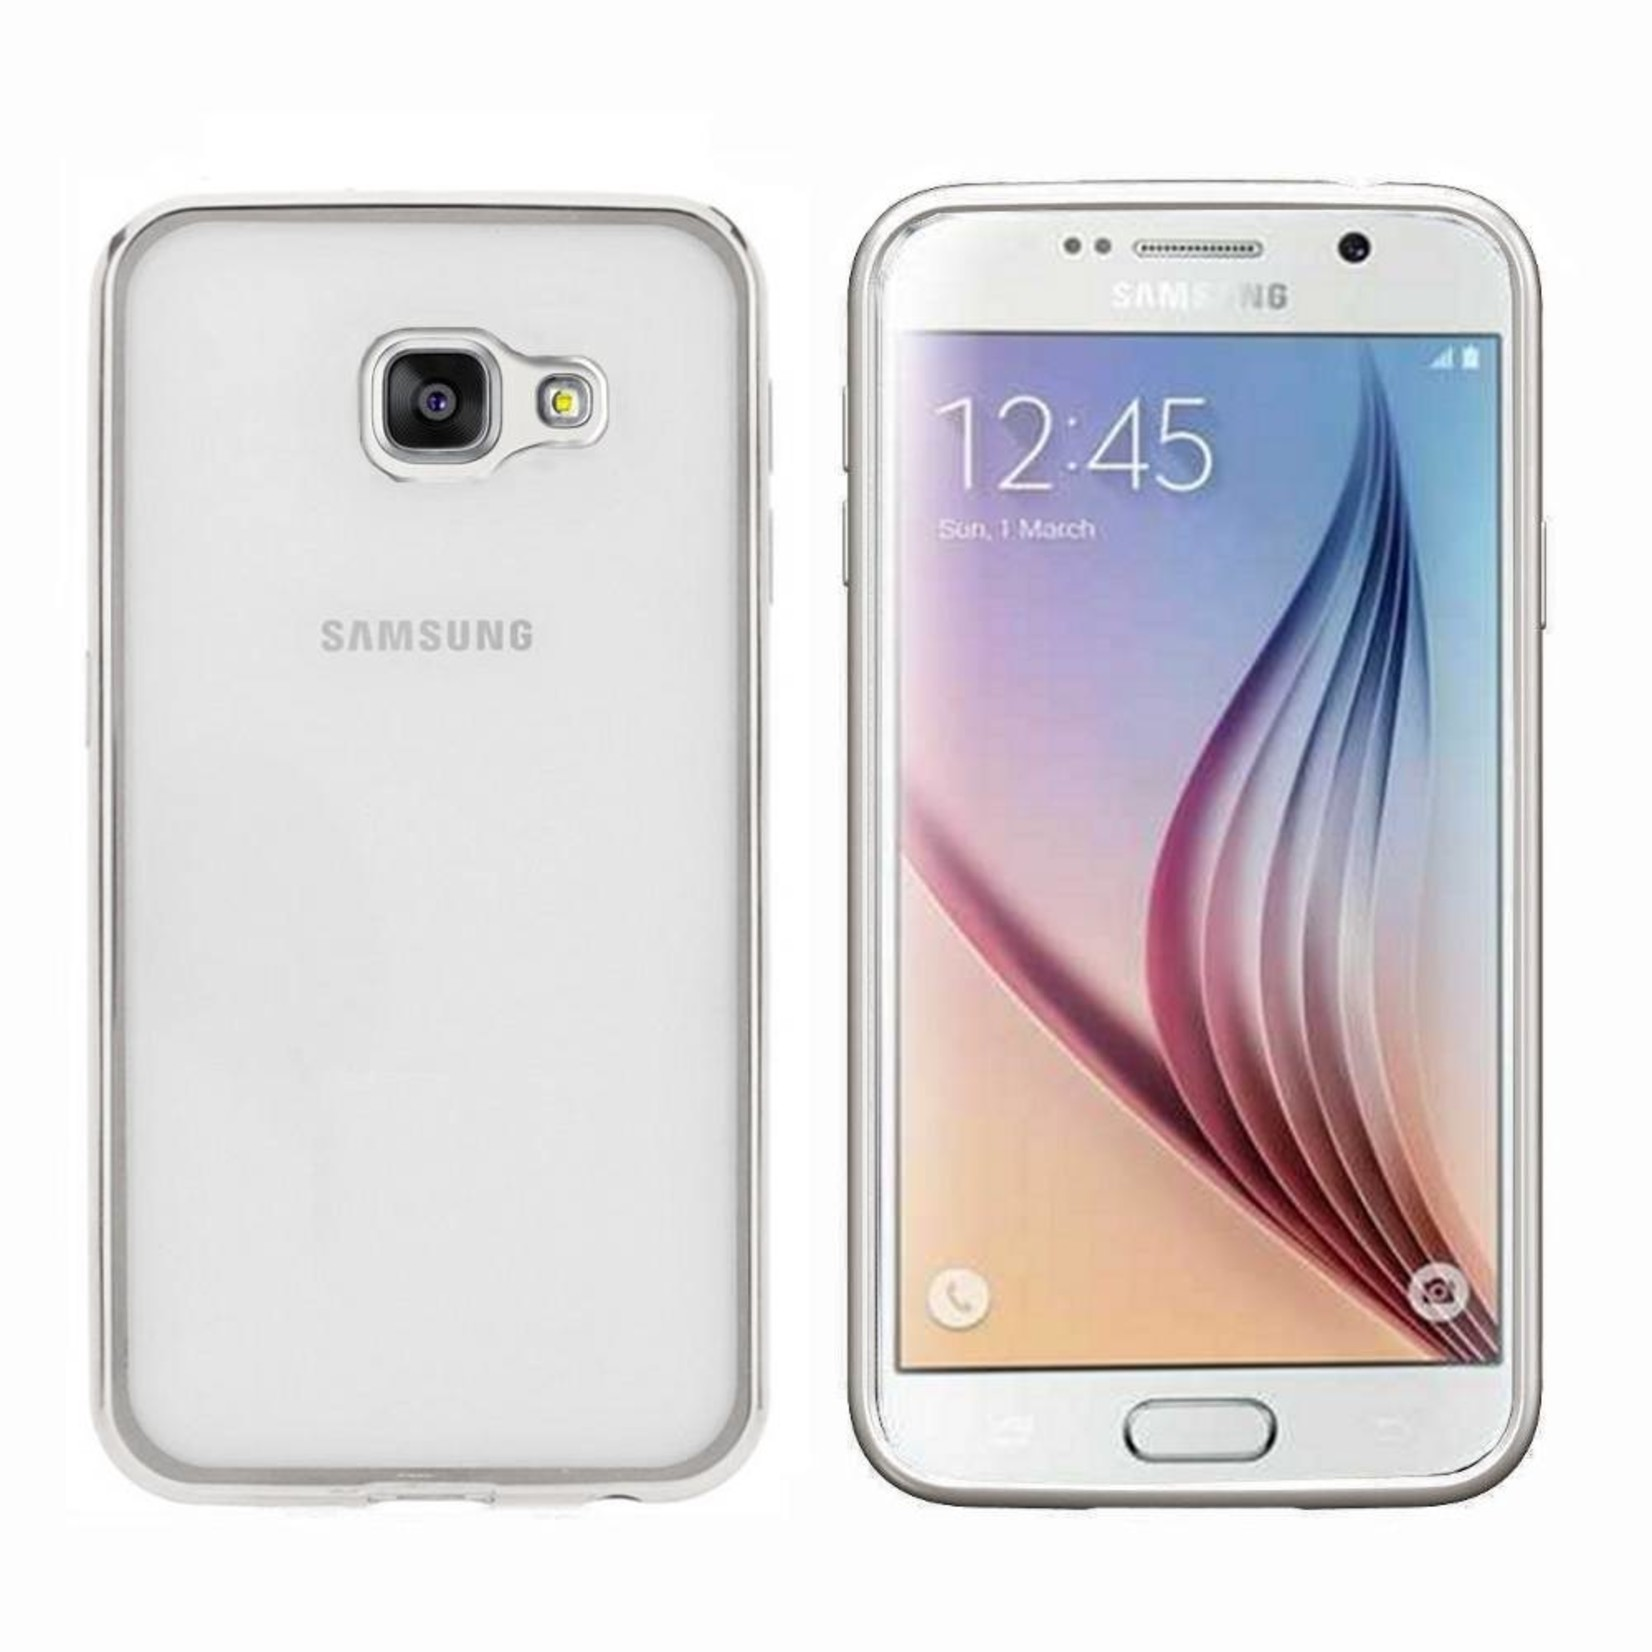 Colorfone Hoesje CoolSkin Bumper Clear Samsung A7 2016 Zilver